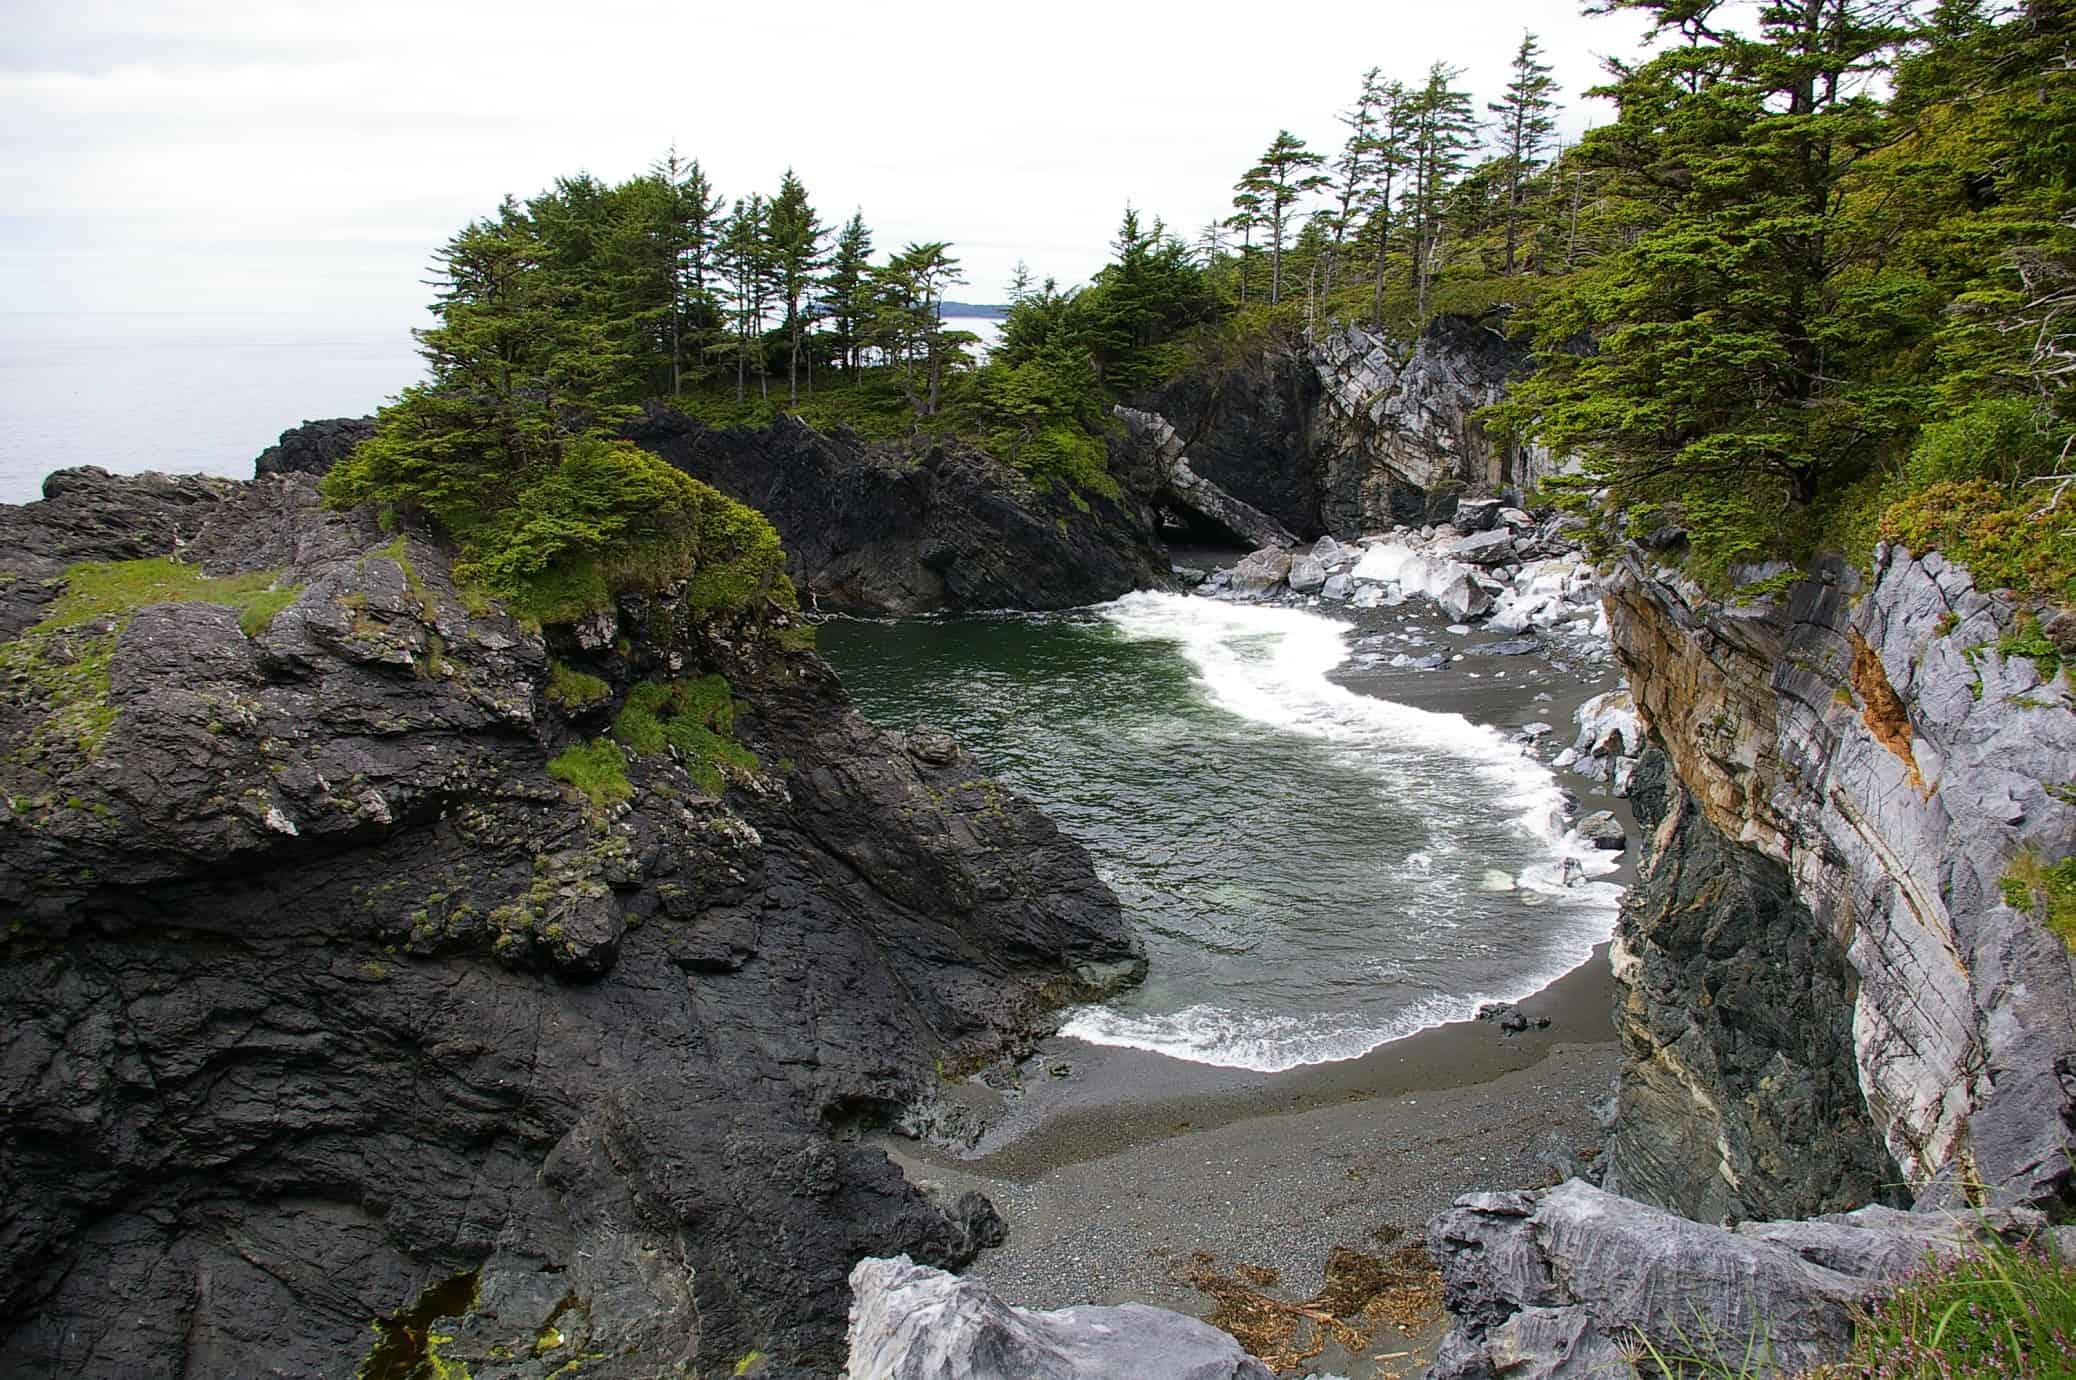 Hiking The Nootka Trail Explore Magazine